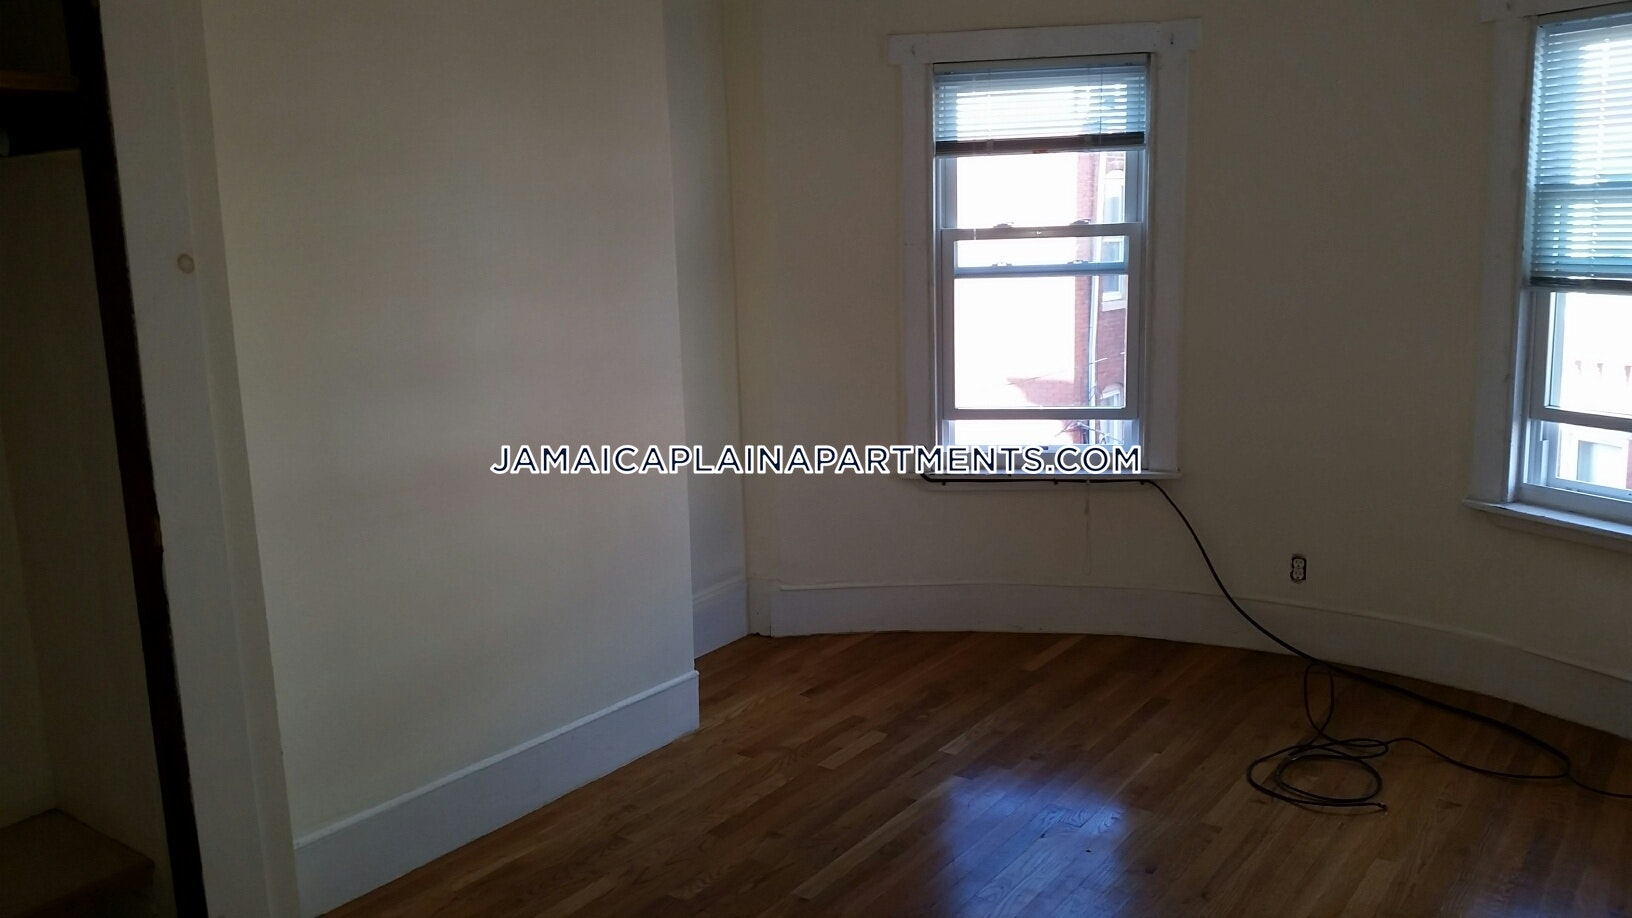 3-beds-1-bath-boston-jamaica-plain-hyde-square-2750-boston-jamaica-plain-hyde-square-2750-384284